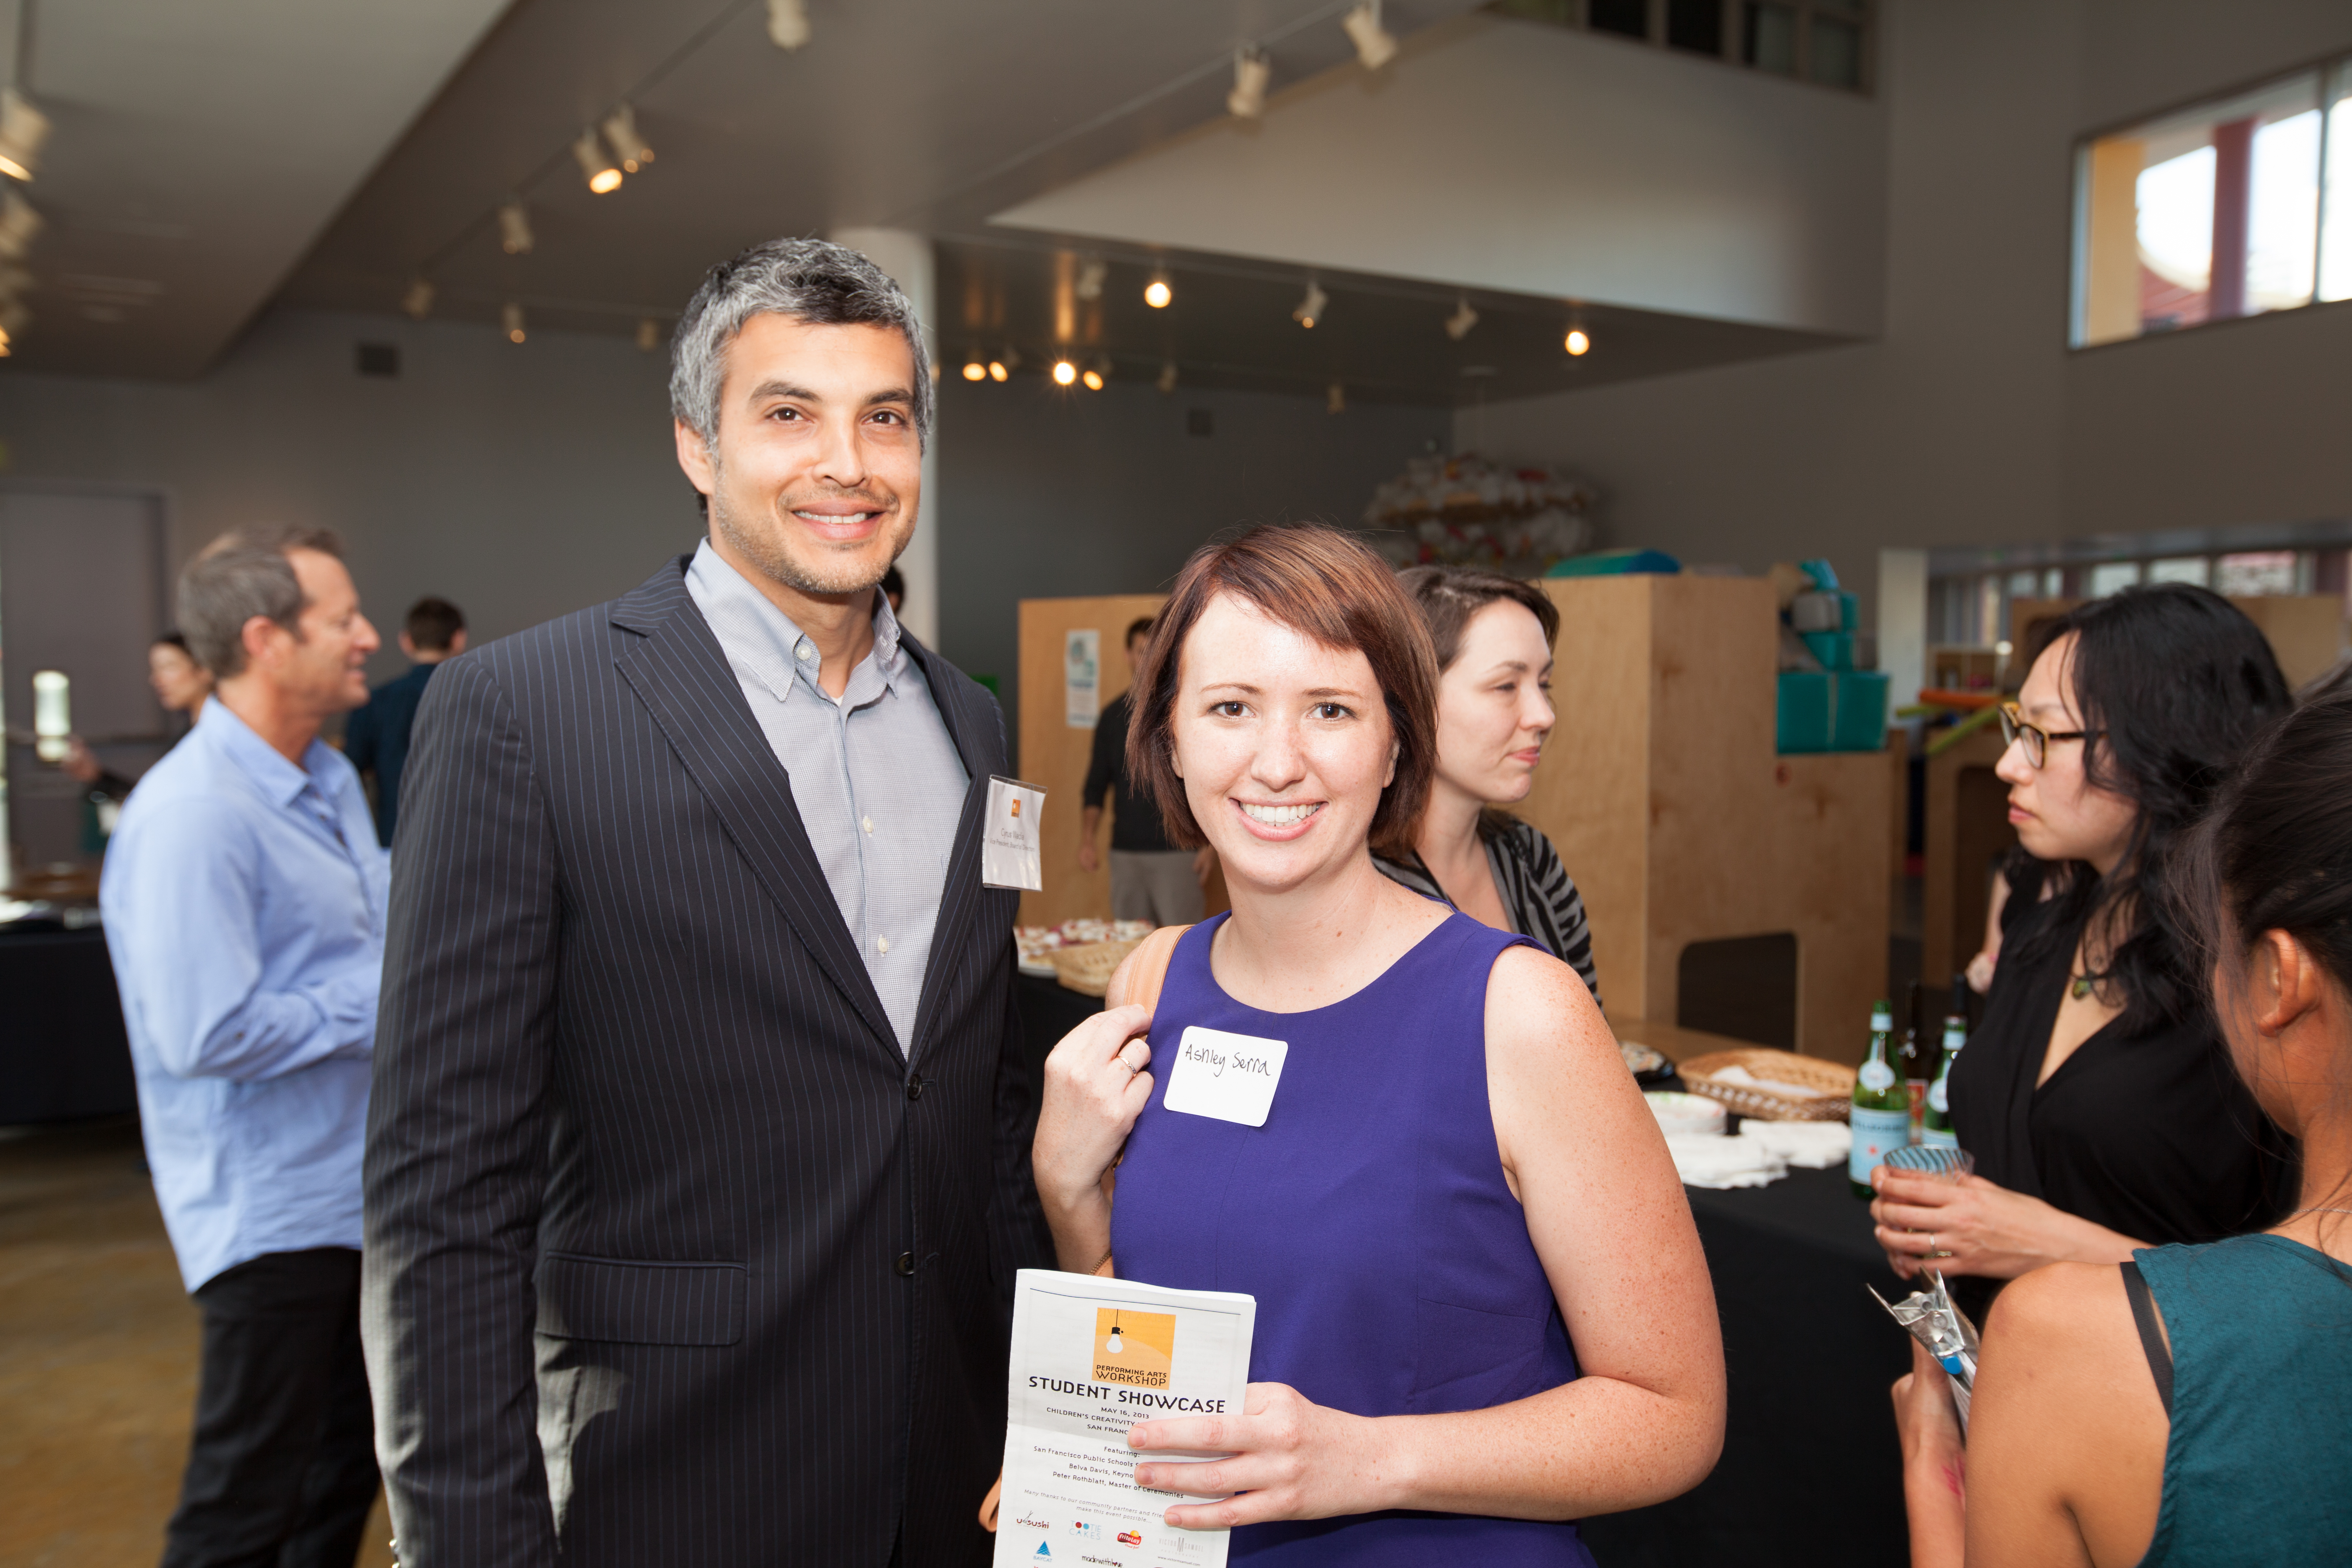 Board President Cyrus Wadia and Board Member Ashley Serra